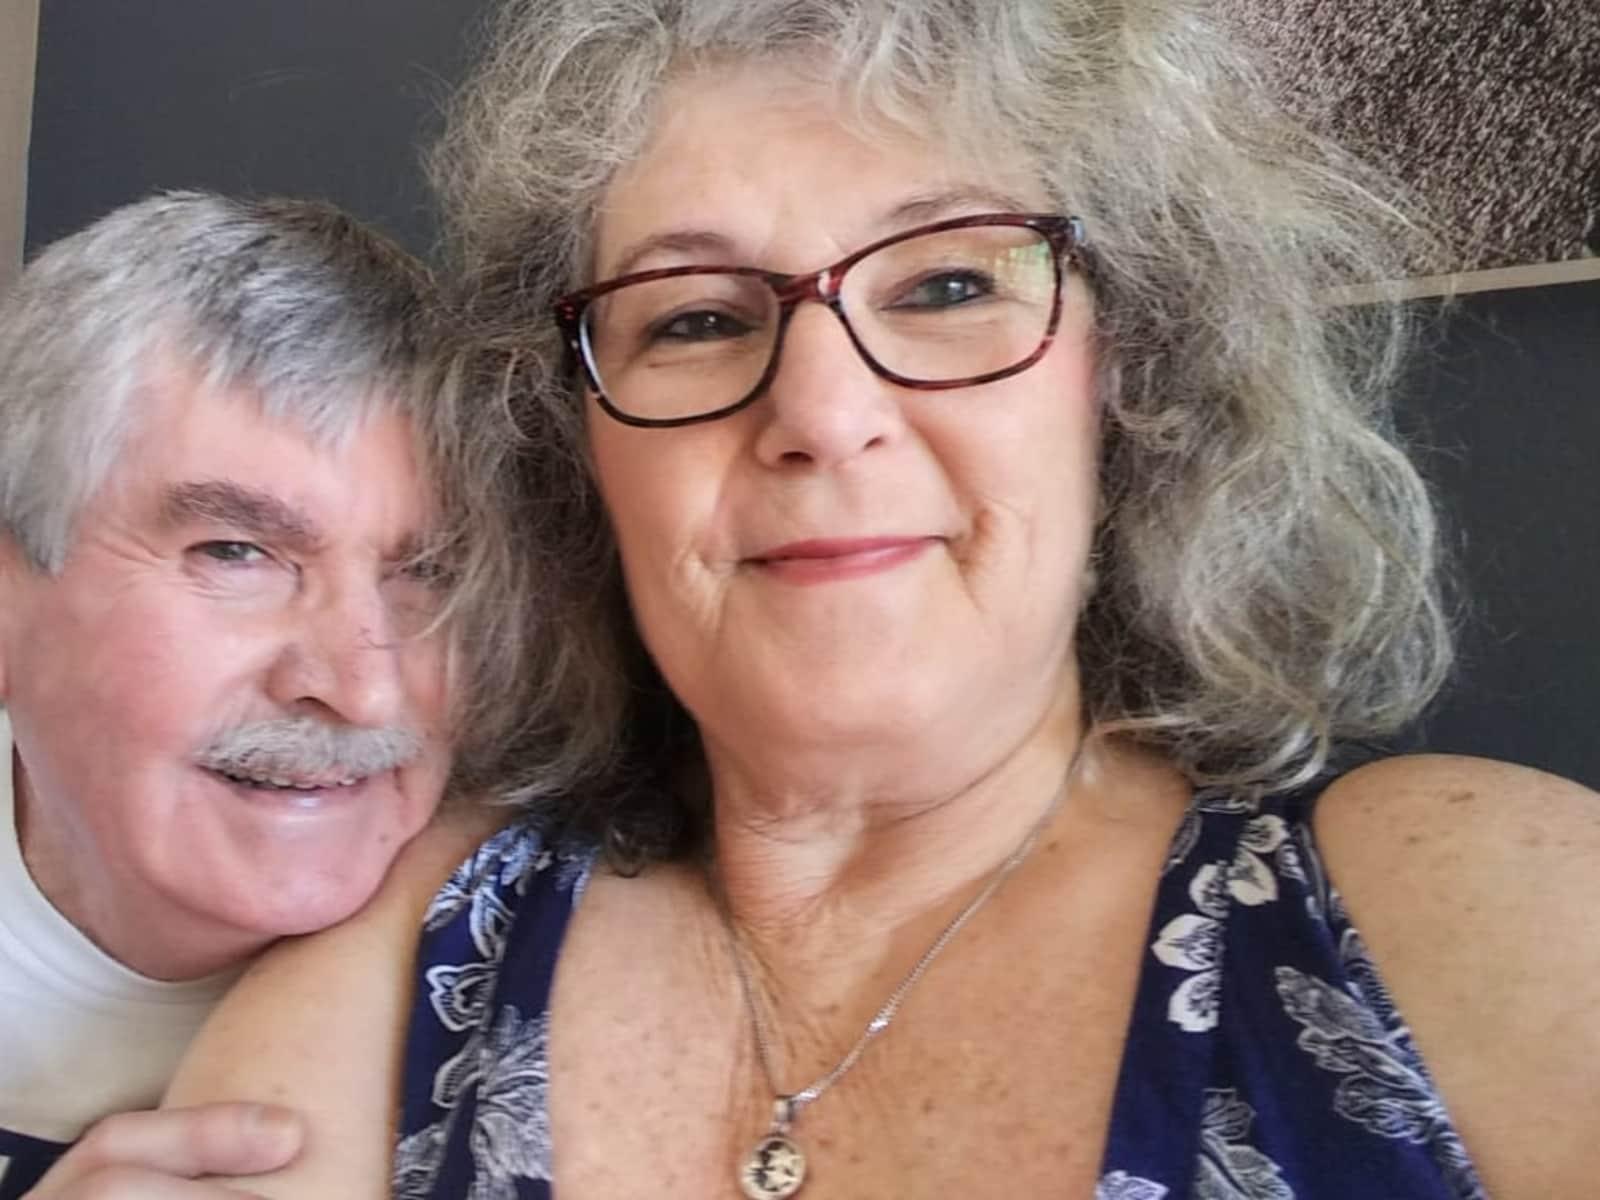 George & Meryl from Wilmslow, United Kingdom